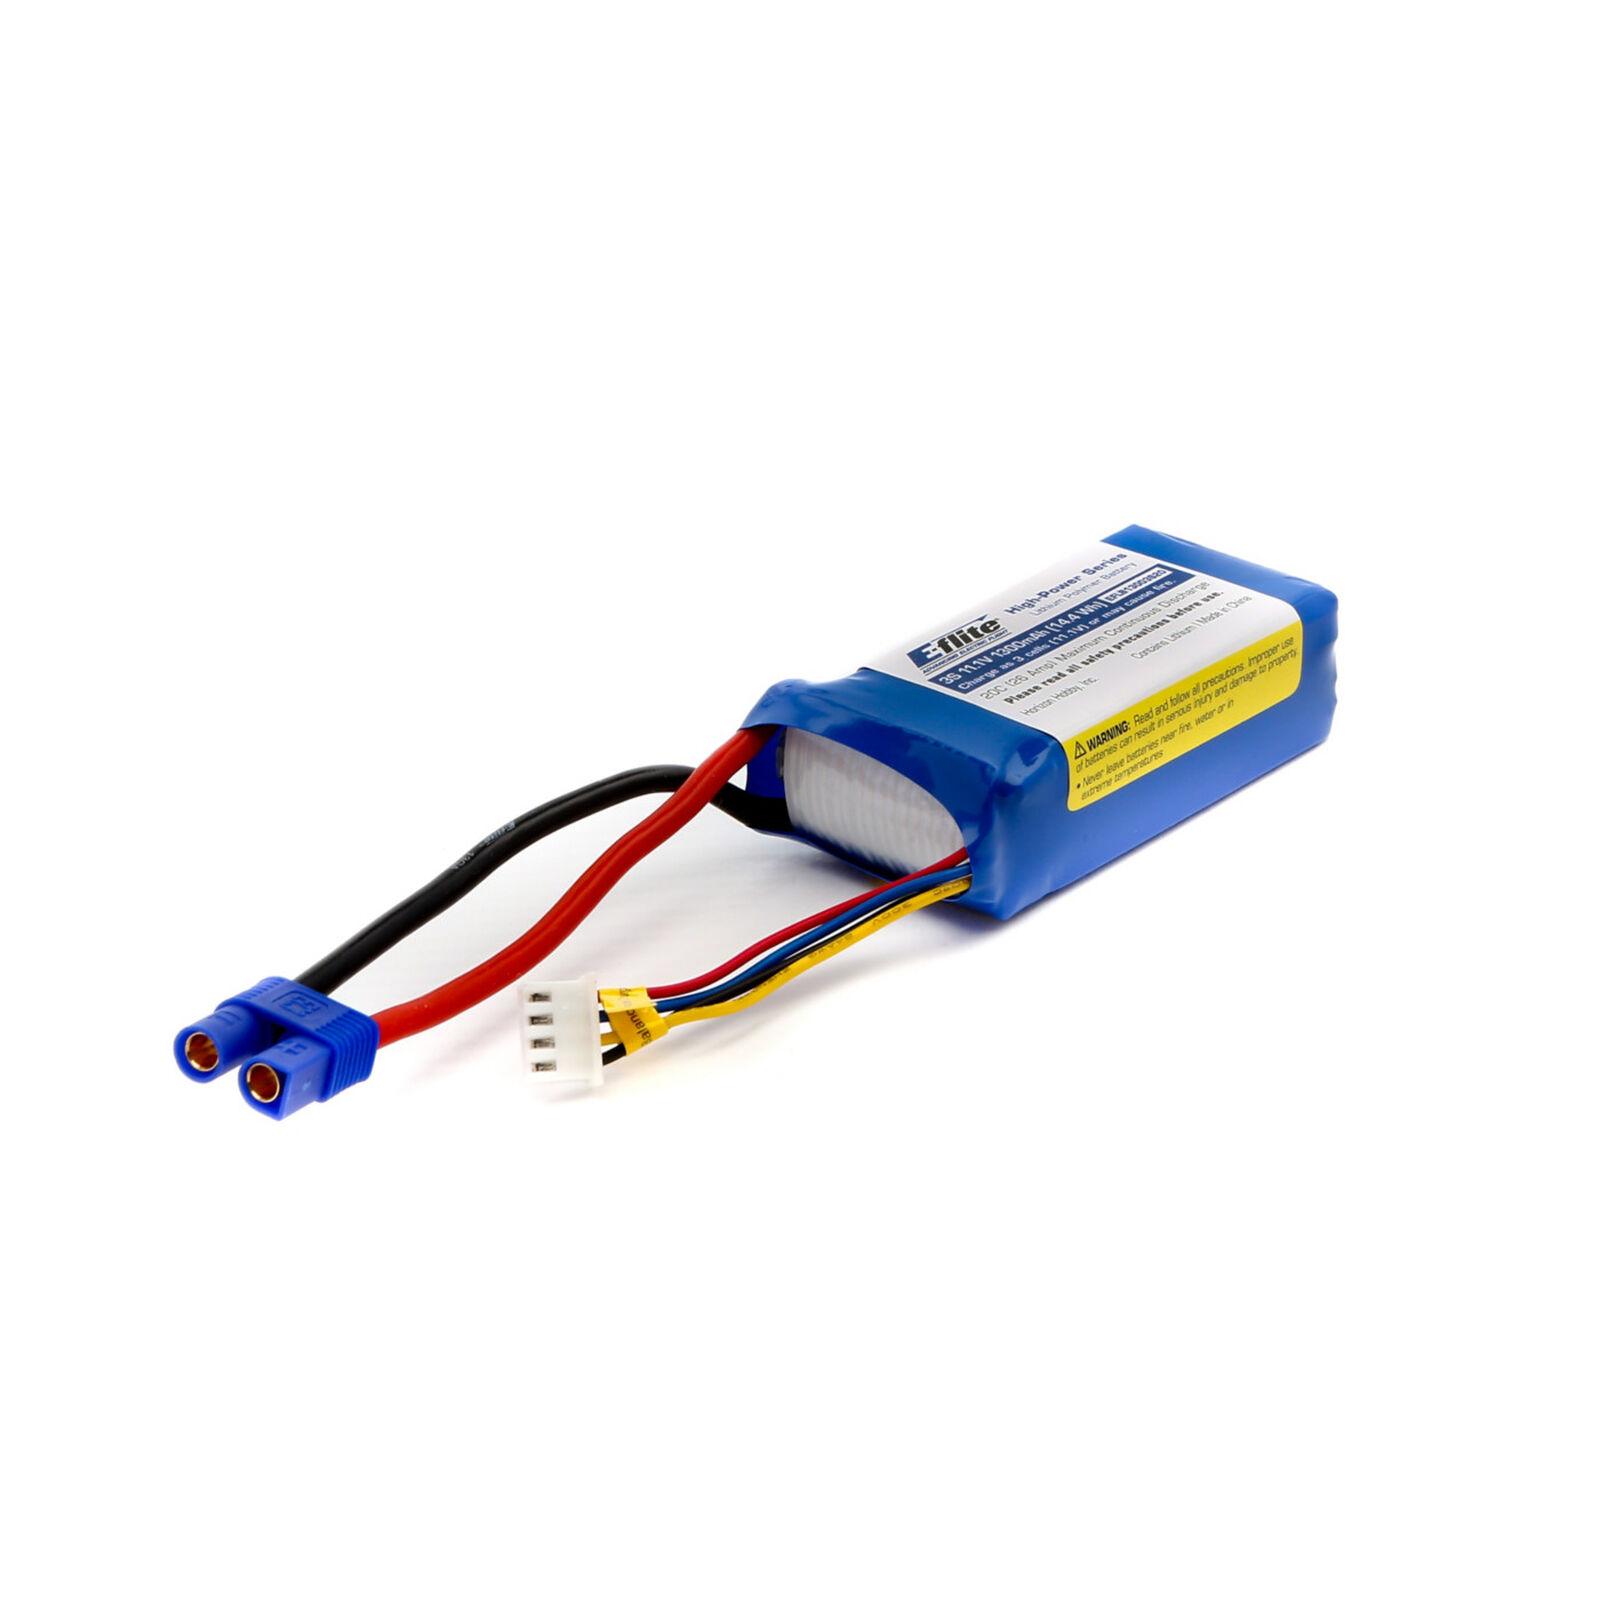 11.1V 1300mAh 3S 20C LiPo Battery: EC3